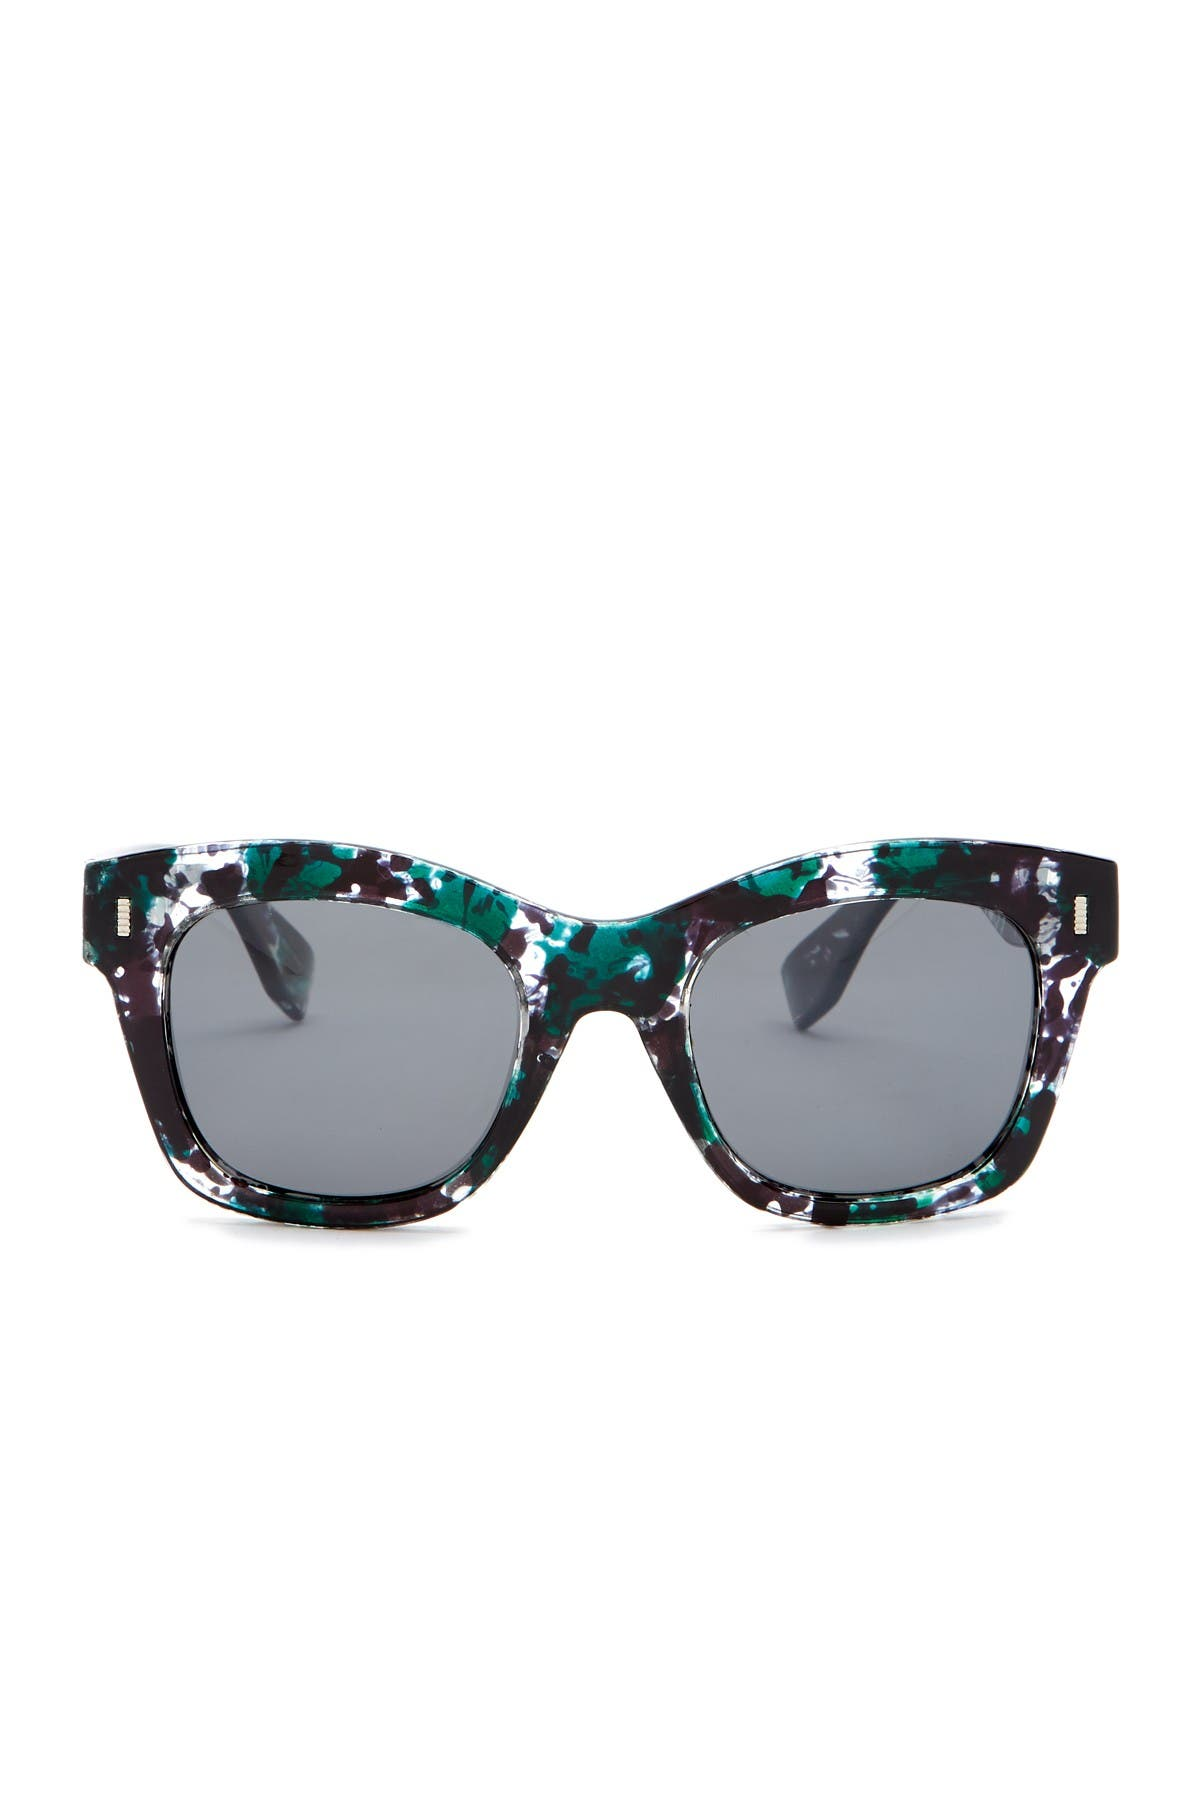 Image of Joe's Jeans 51mm Squared Cat Eye Sunglasses